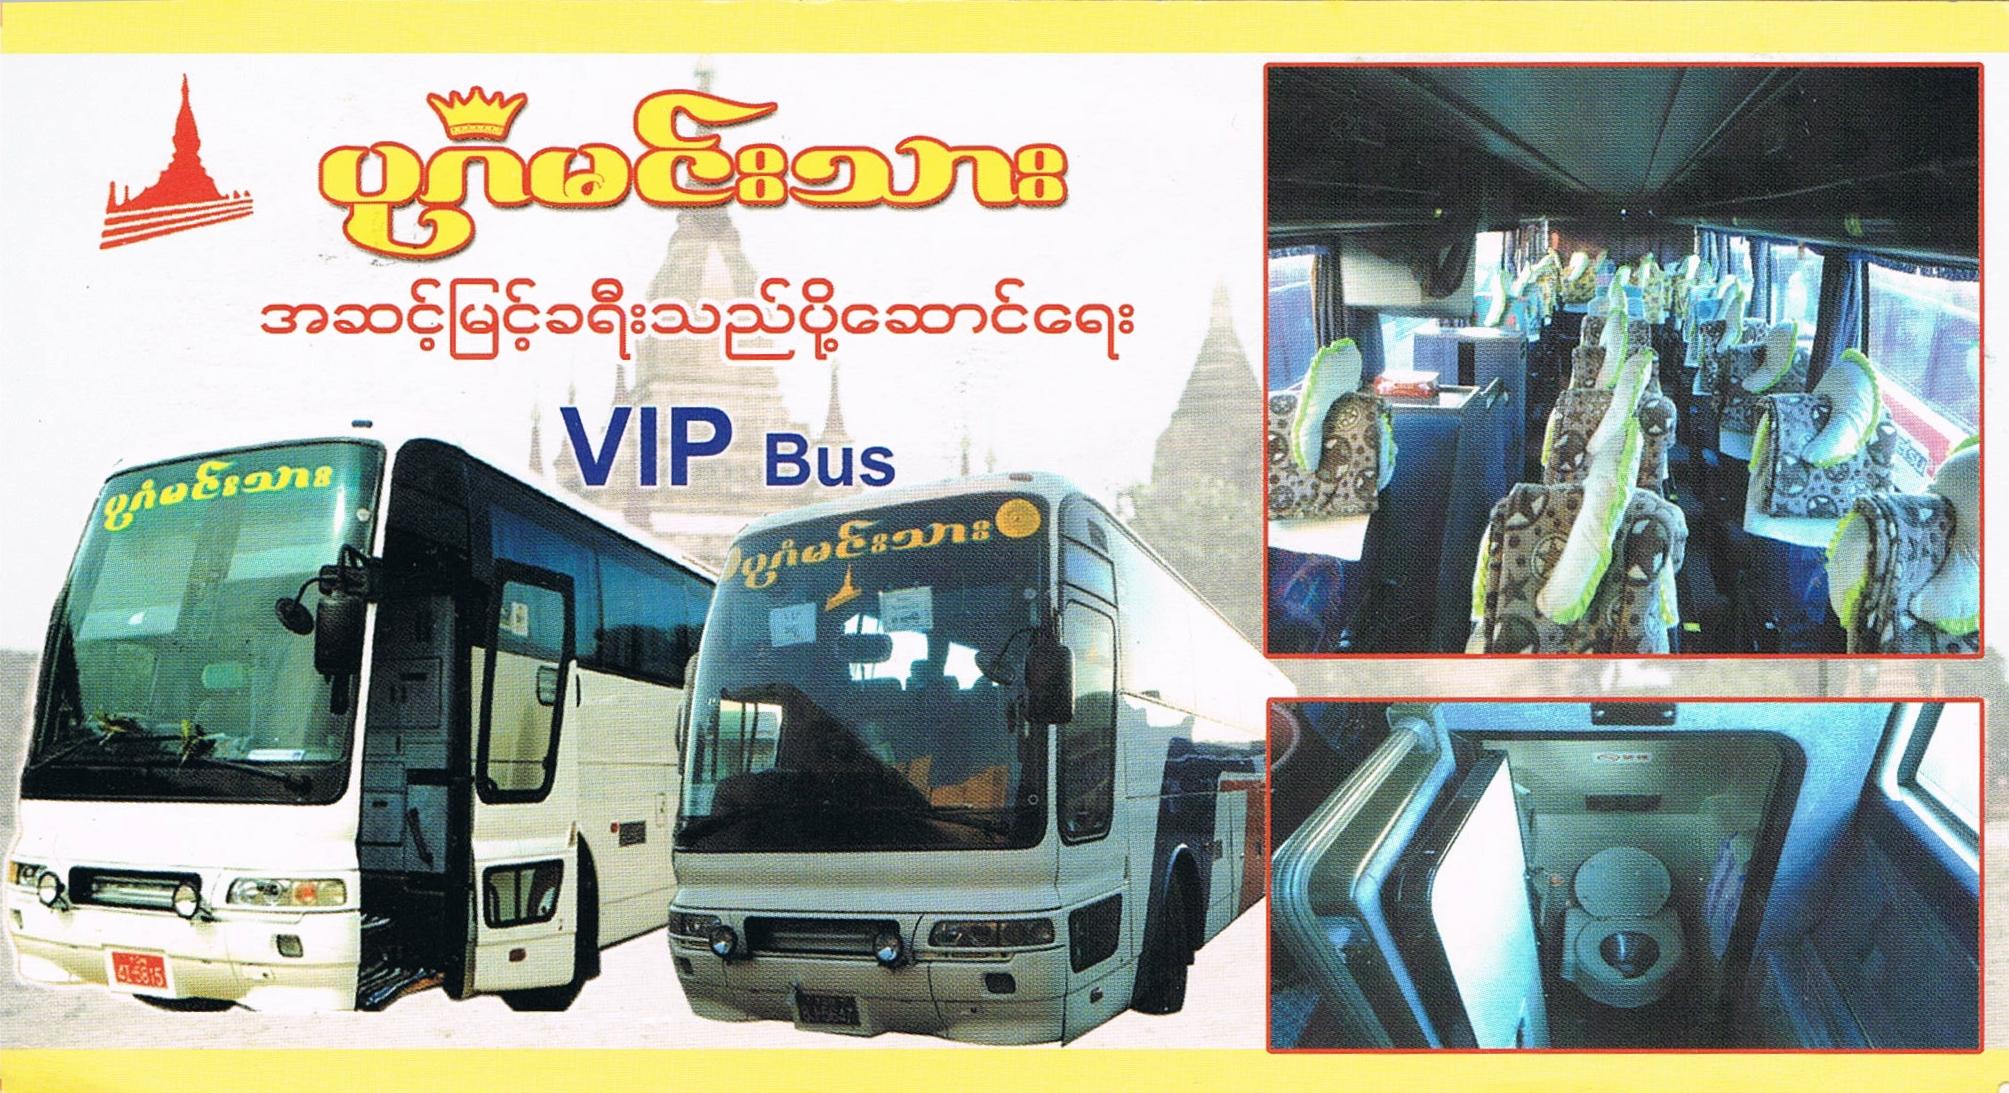 Bagan Prince Express Vip Bus